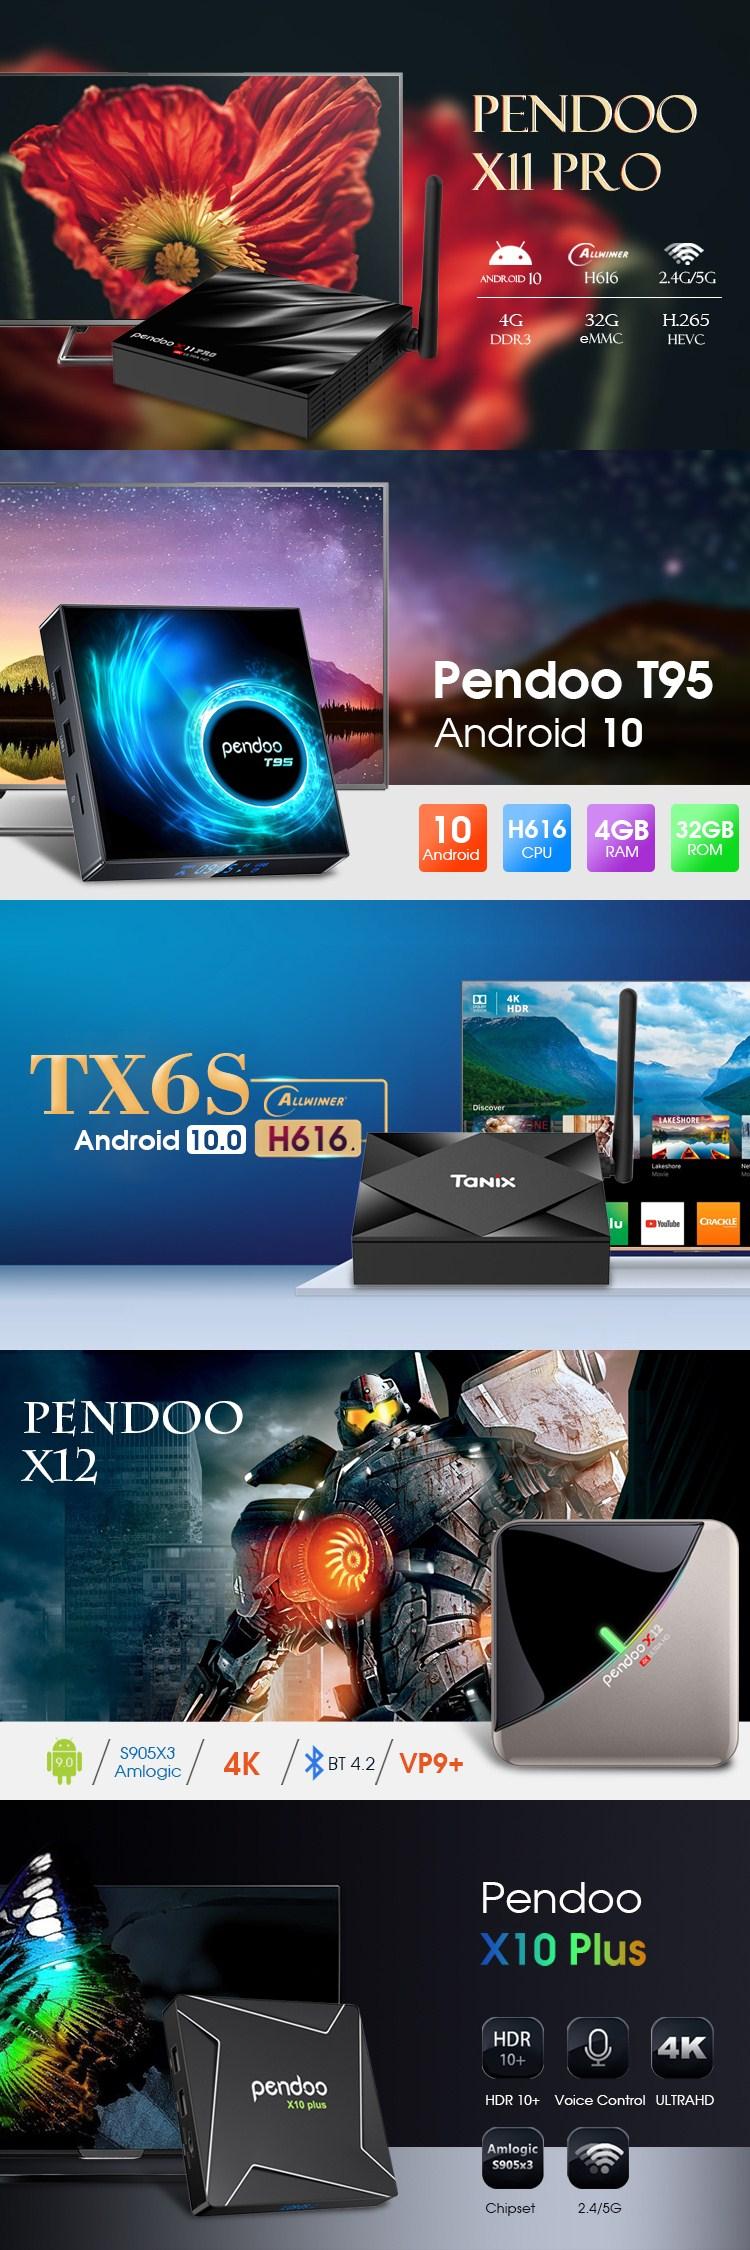 2gb 8gb Tx6s H616 Manufacturer 4gb Ram Setup Firmware Update Ott 4 K Sim Card 8k Android Tv Box